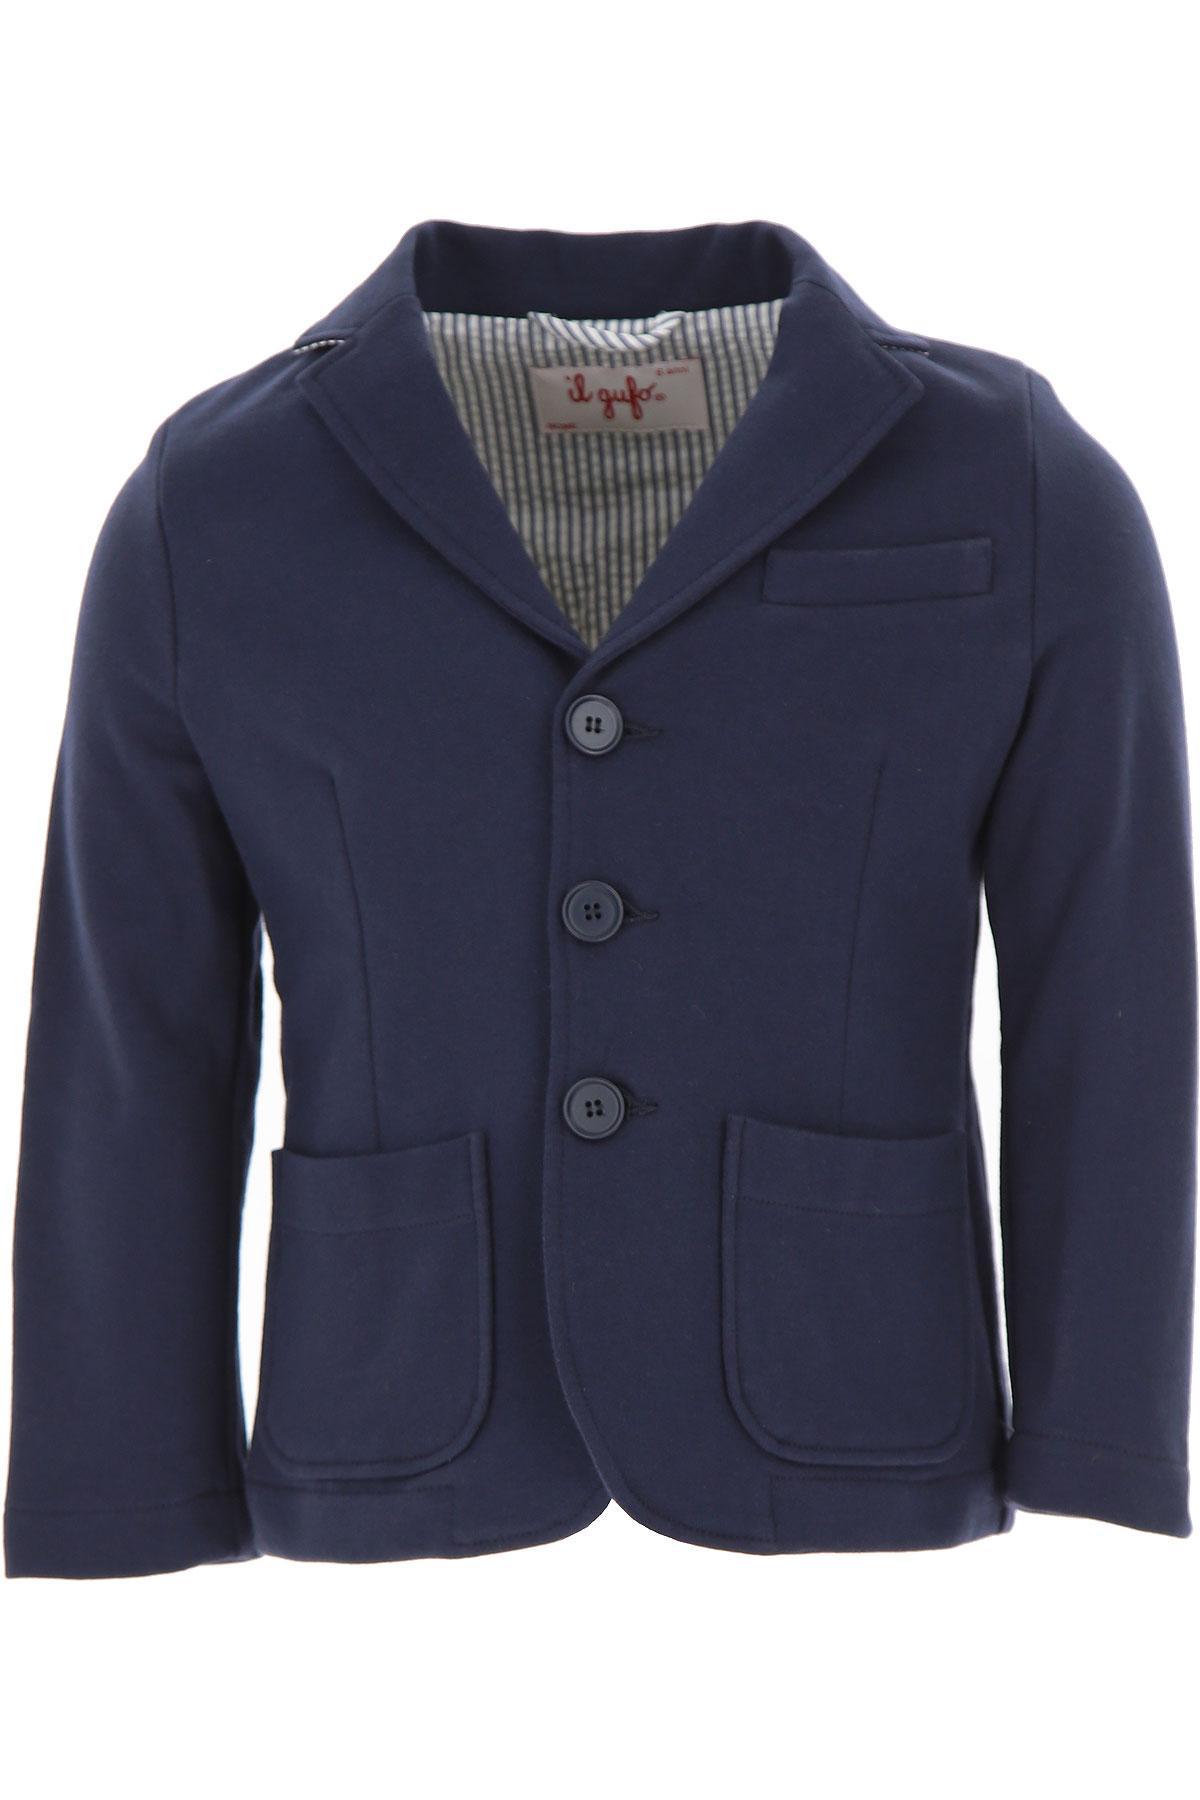 Image of Il Gufo Kids Blazer for Boys On Sale, Blue, Cotton, 2017, 10Y 6Y 8Y